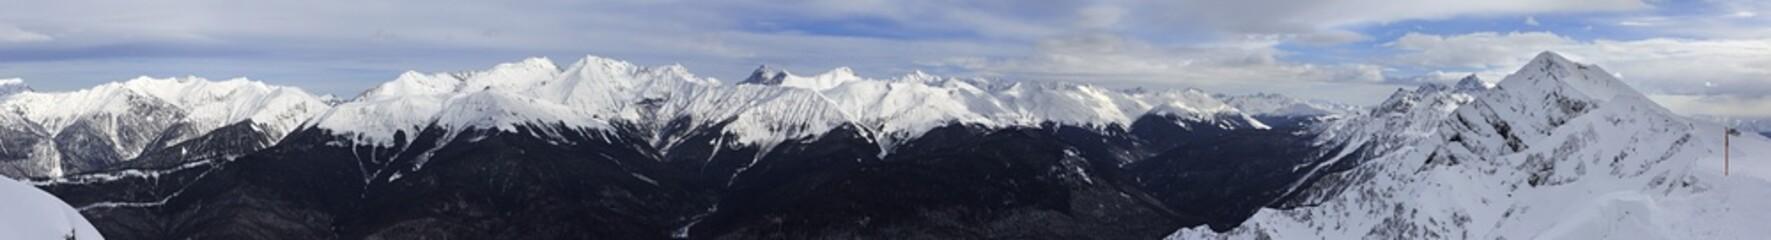 Panorama of Caucasus Mountains in Rosa Khutor Alpine Resort